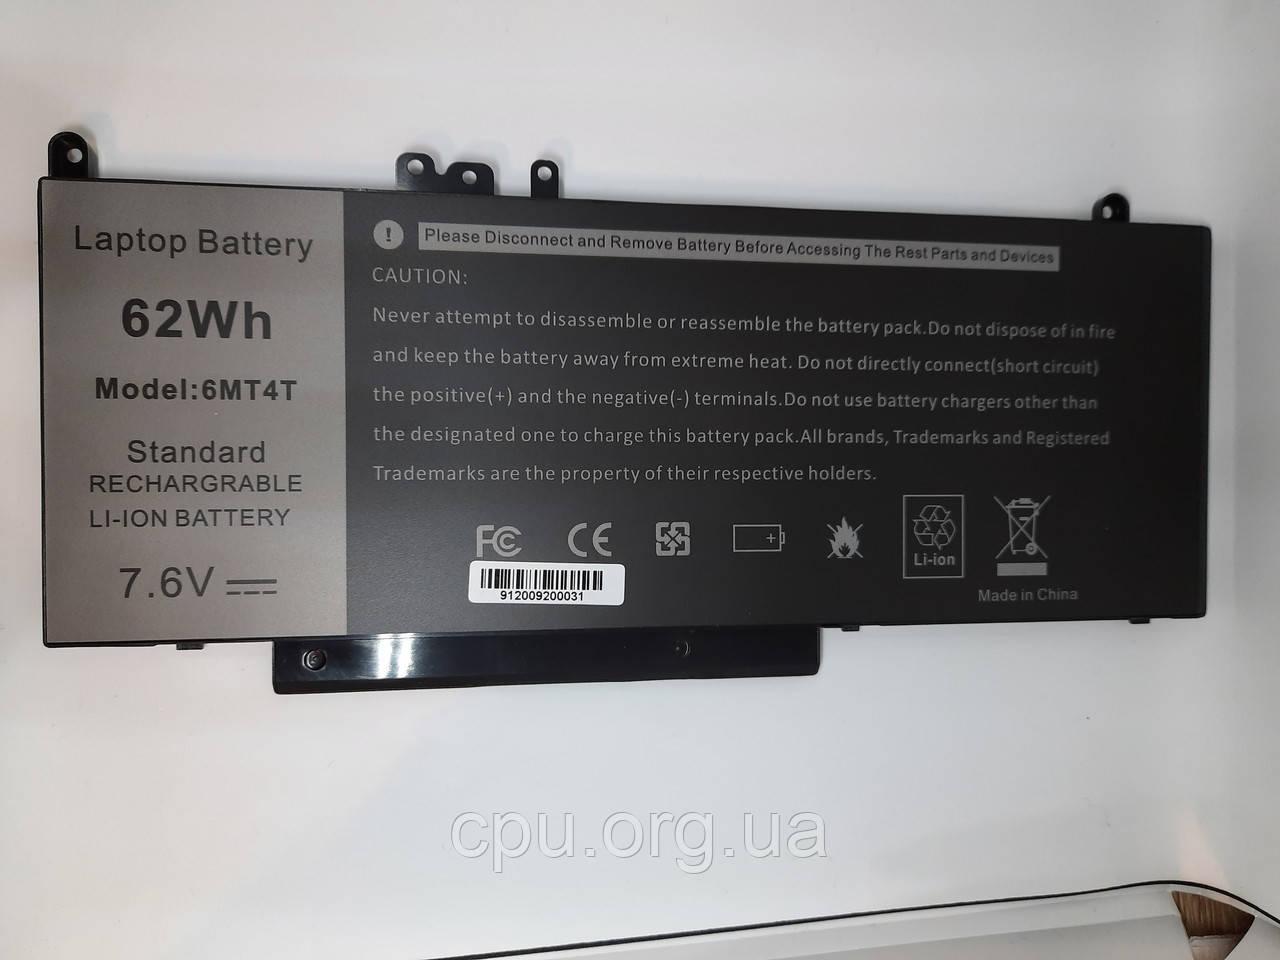 Аккумулятор батарея Dell Latitude E5470 E5570 7.6V 62Wh 6MT4T